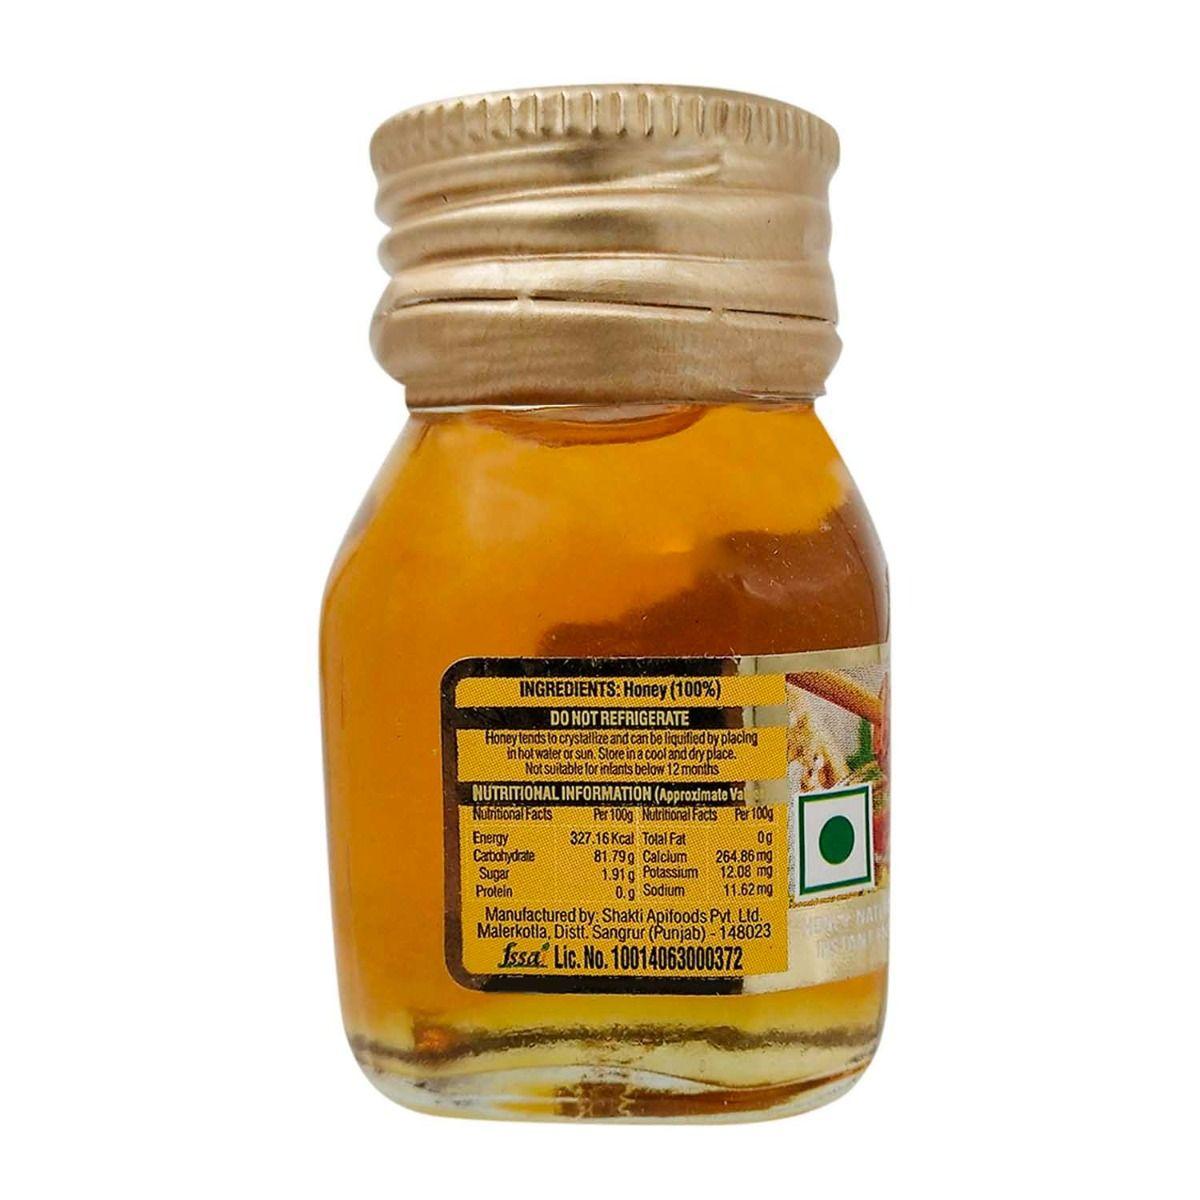 Apollo Life Honey, 50 gm, Pack of 1